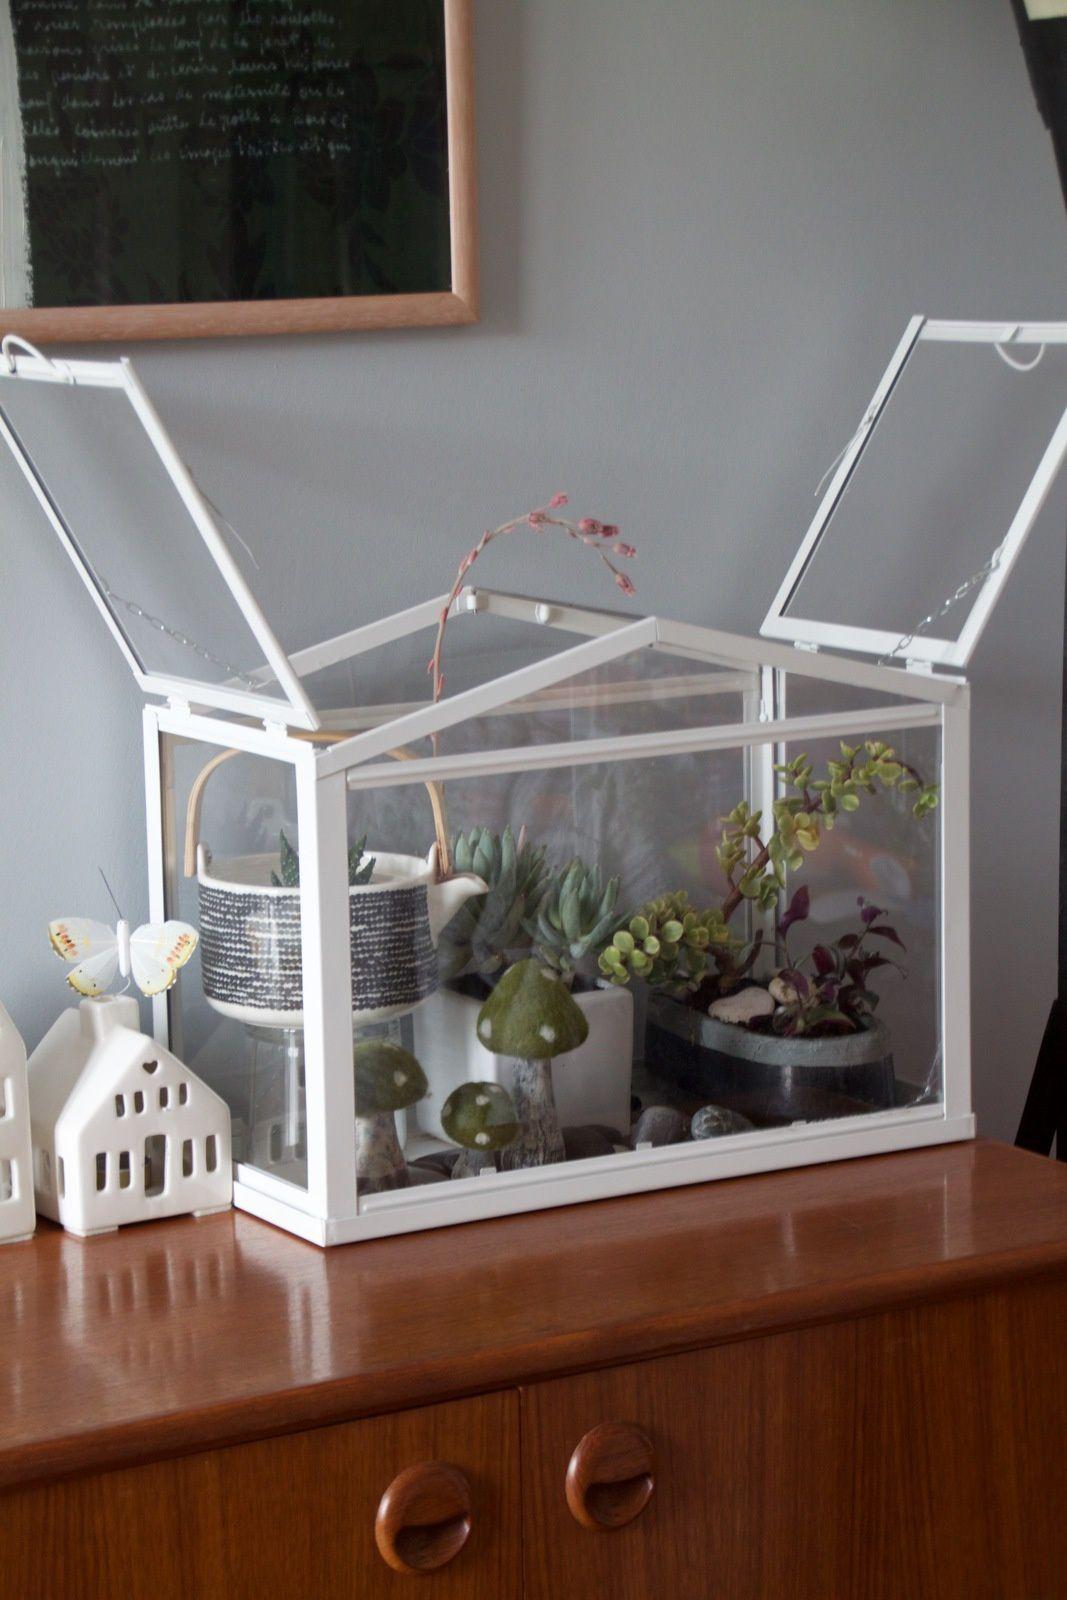 deco idee serre. Black Bedroom Furniture Sets. Home Design Ideas